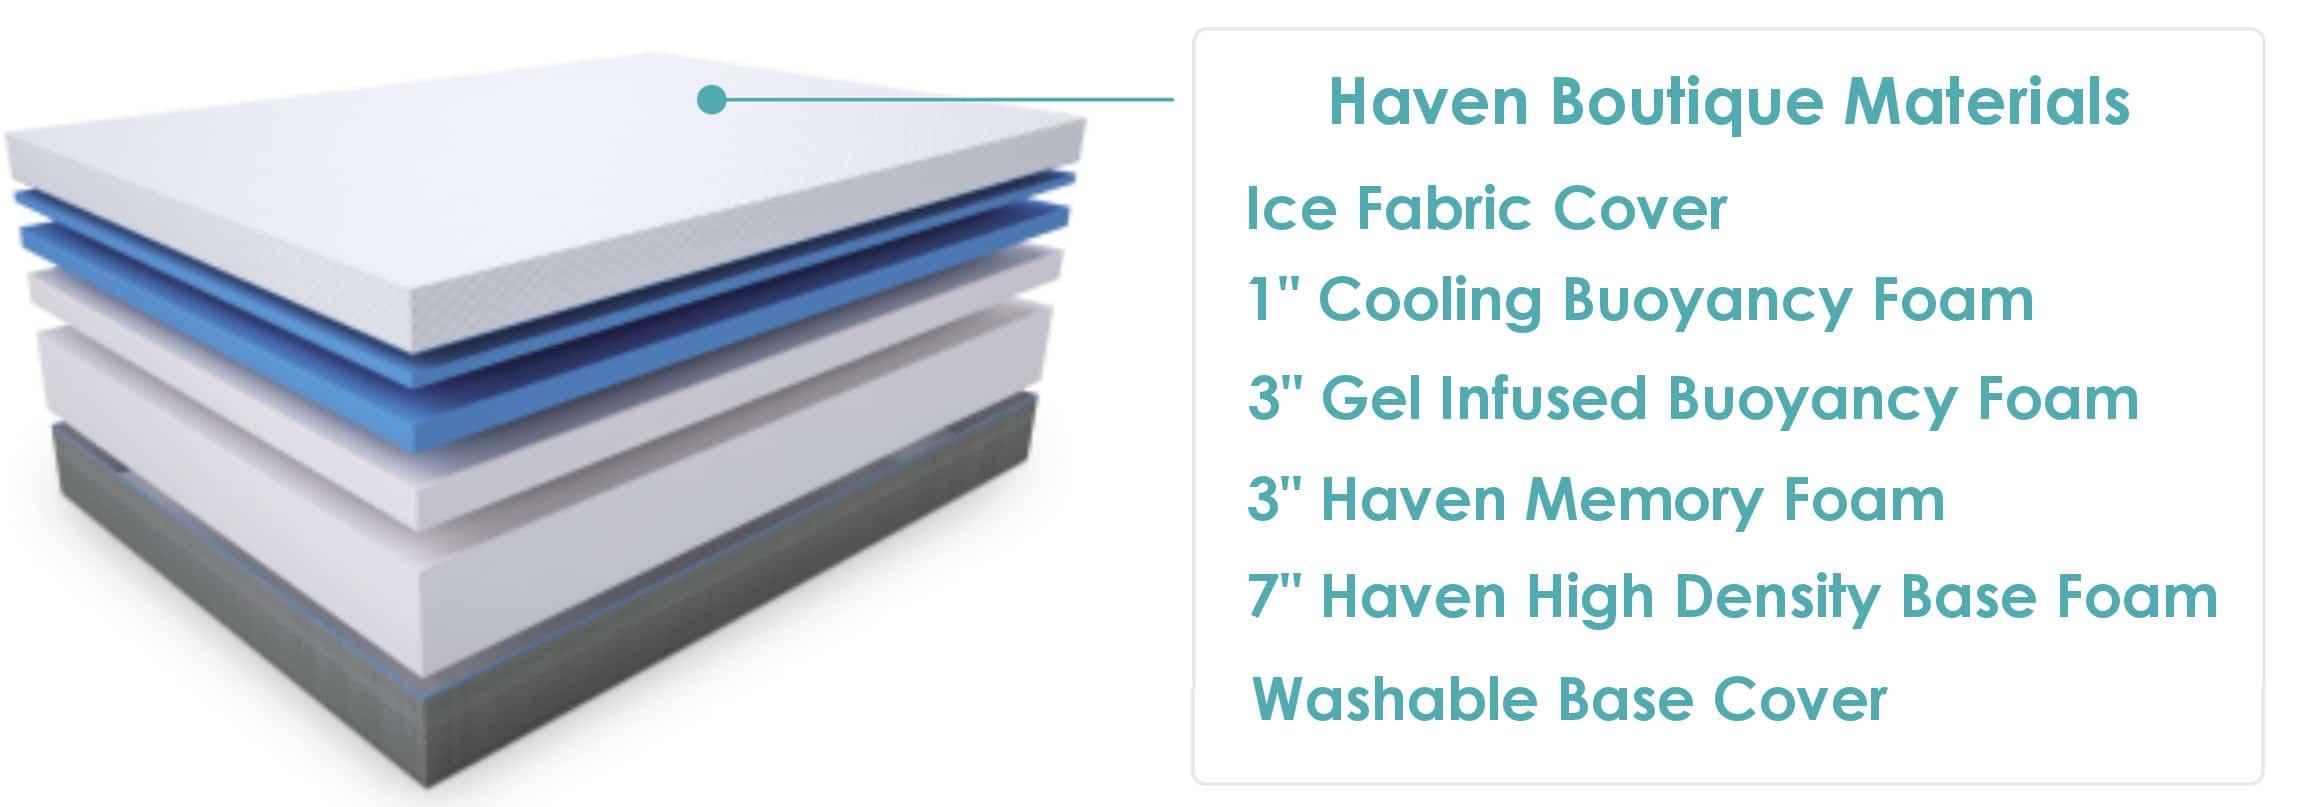 haven boutique mattress materials